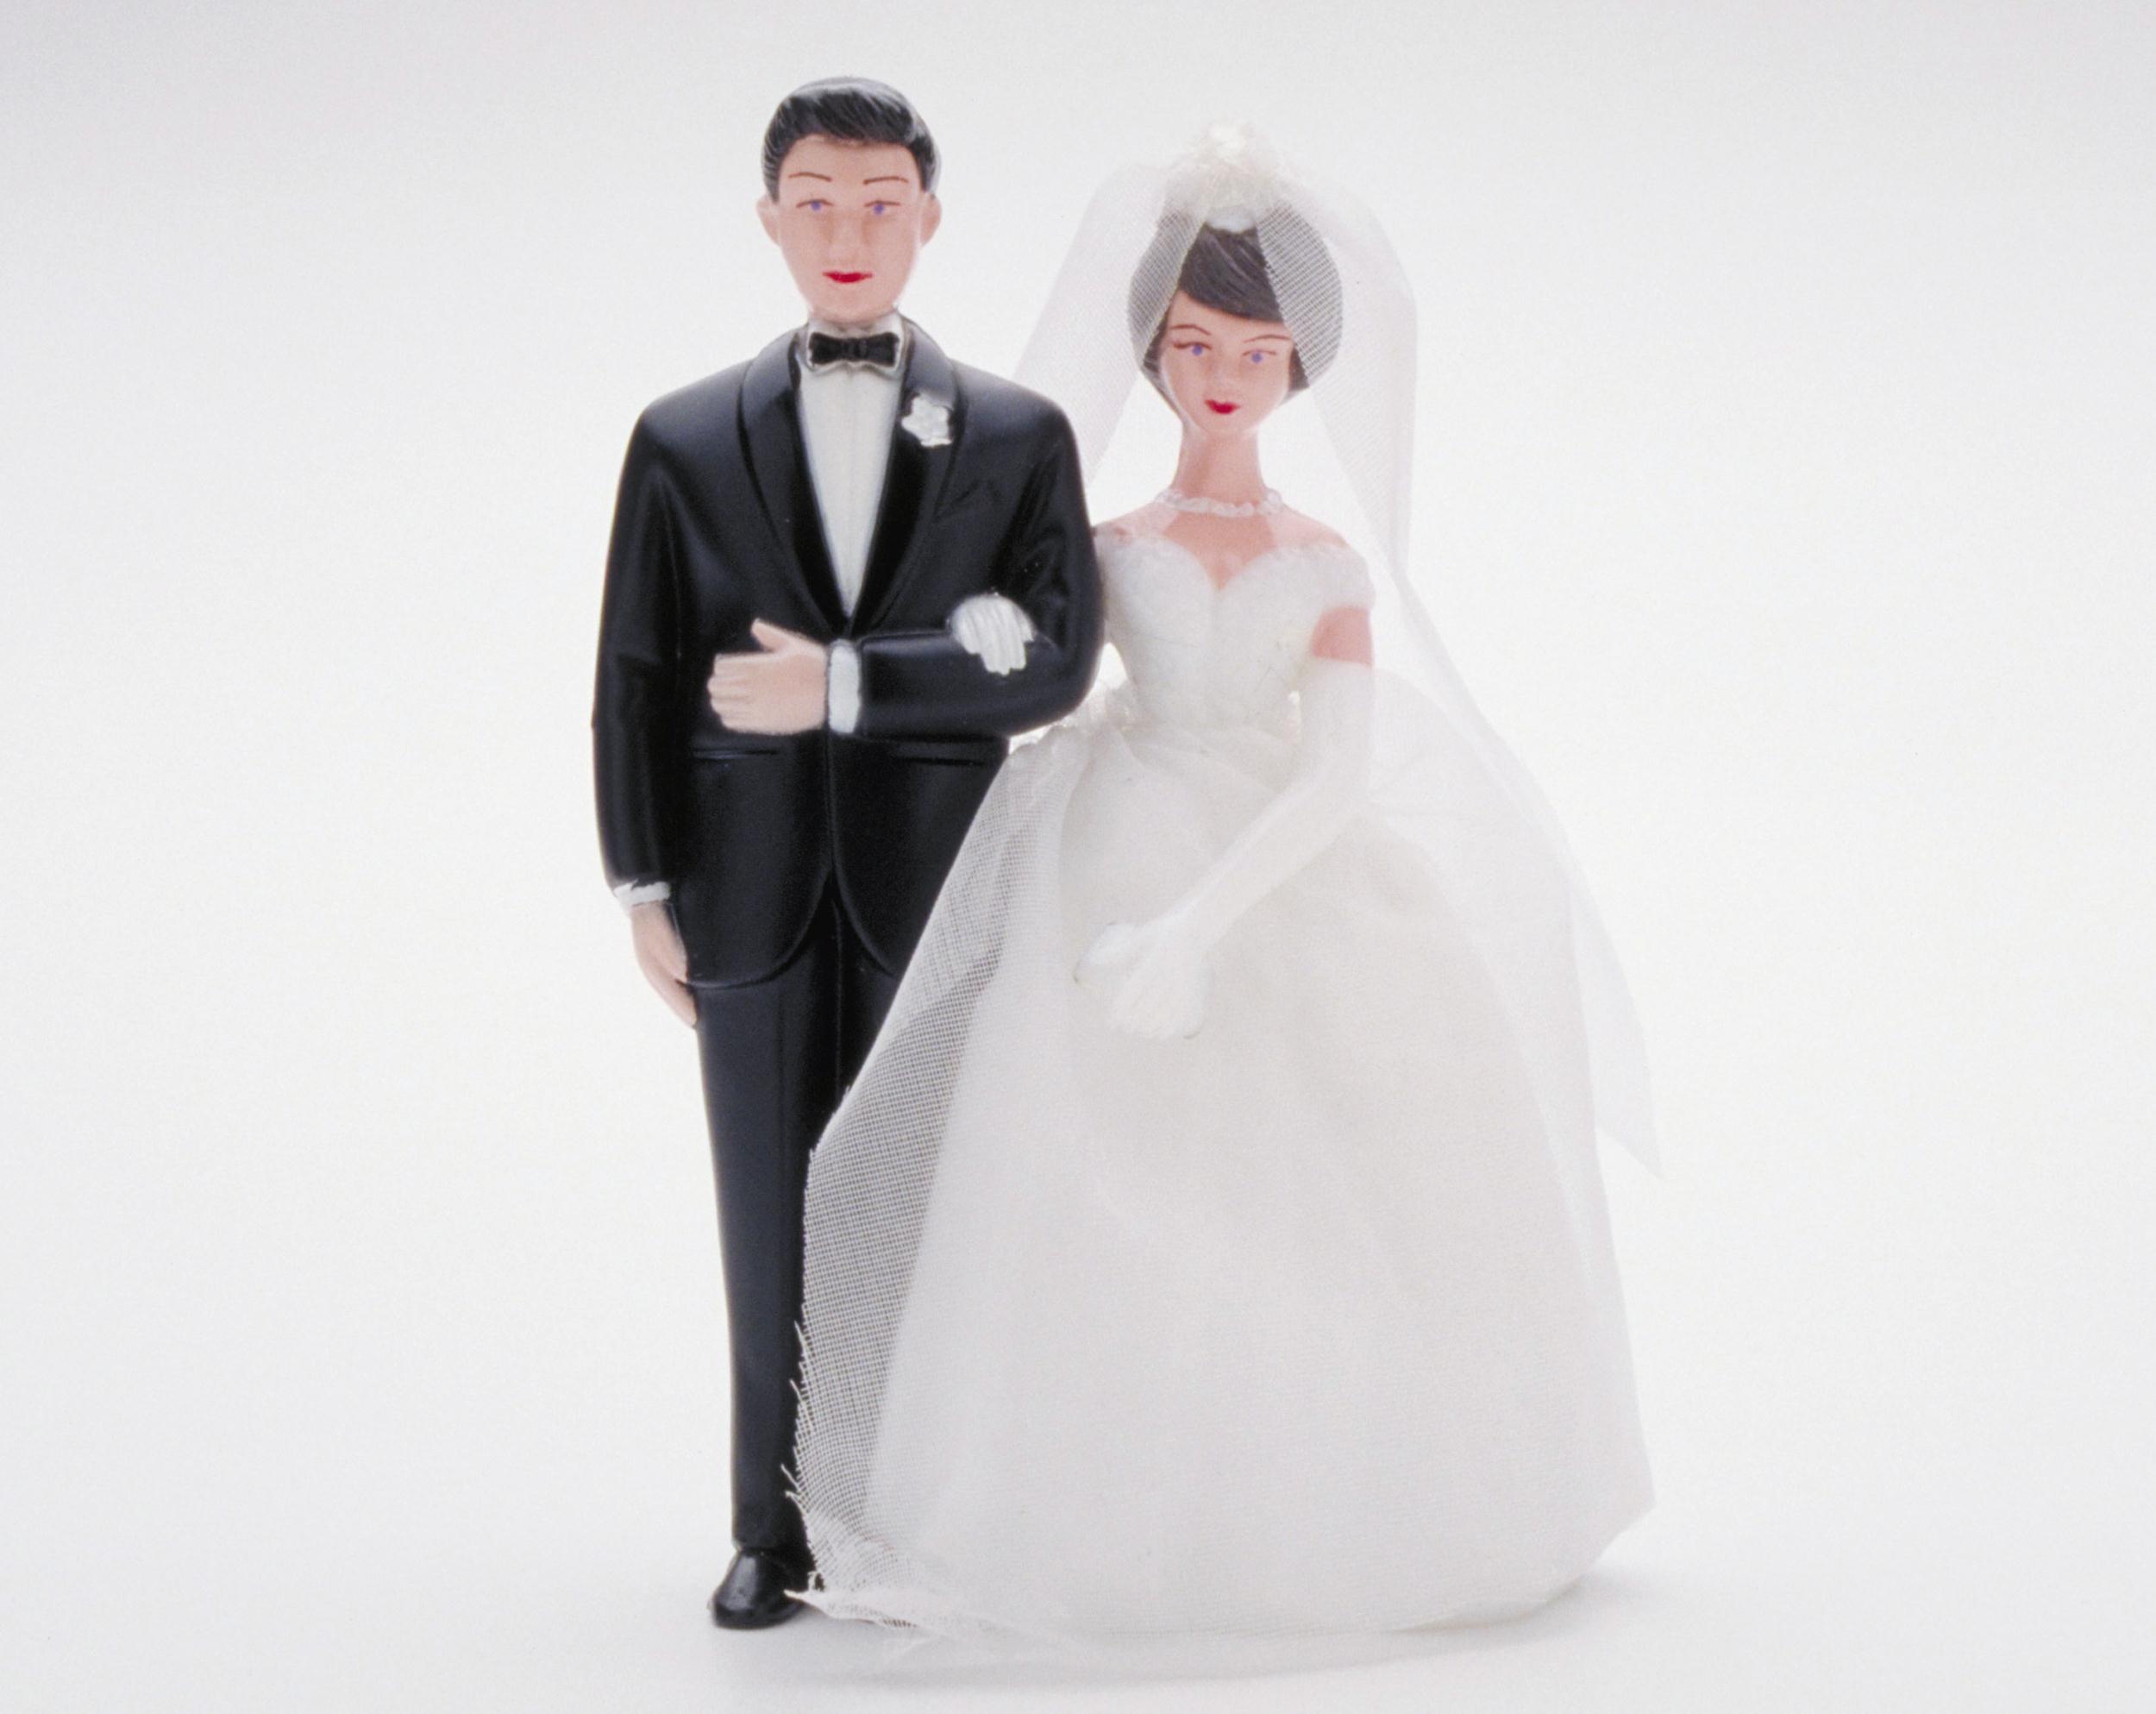 بالصور خلفيات زواج , صور خلفيات مميزه لا مثيل لها لاجمل عروسين 3626 4